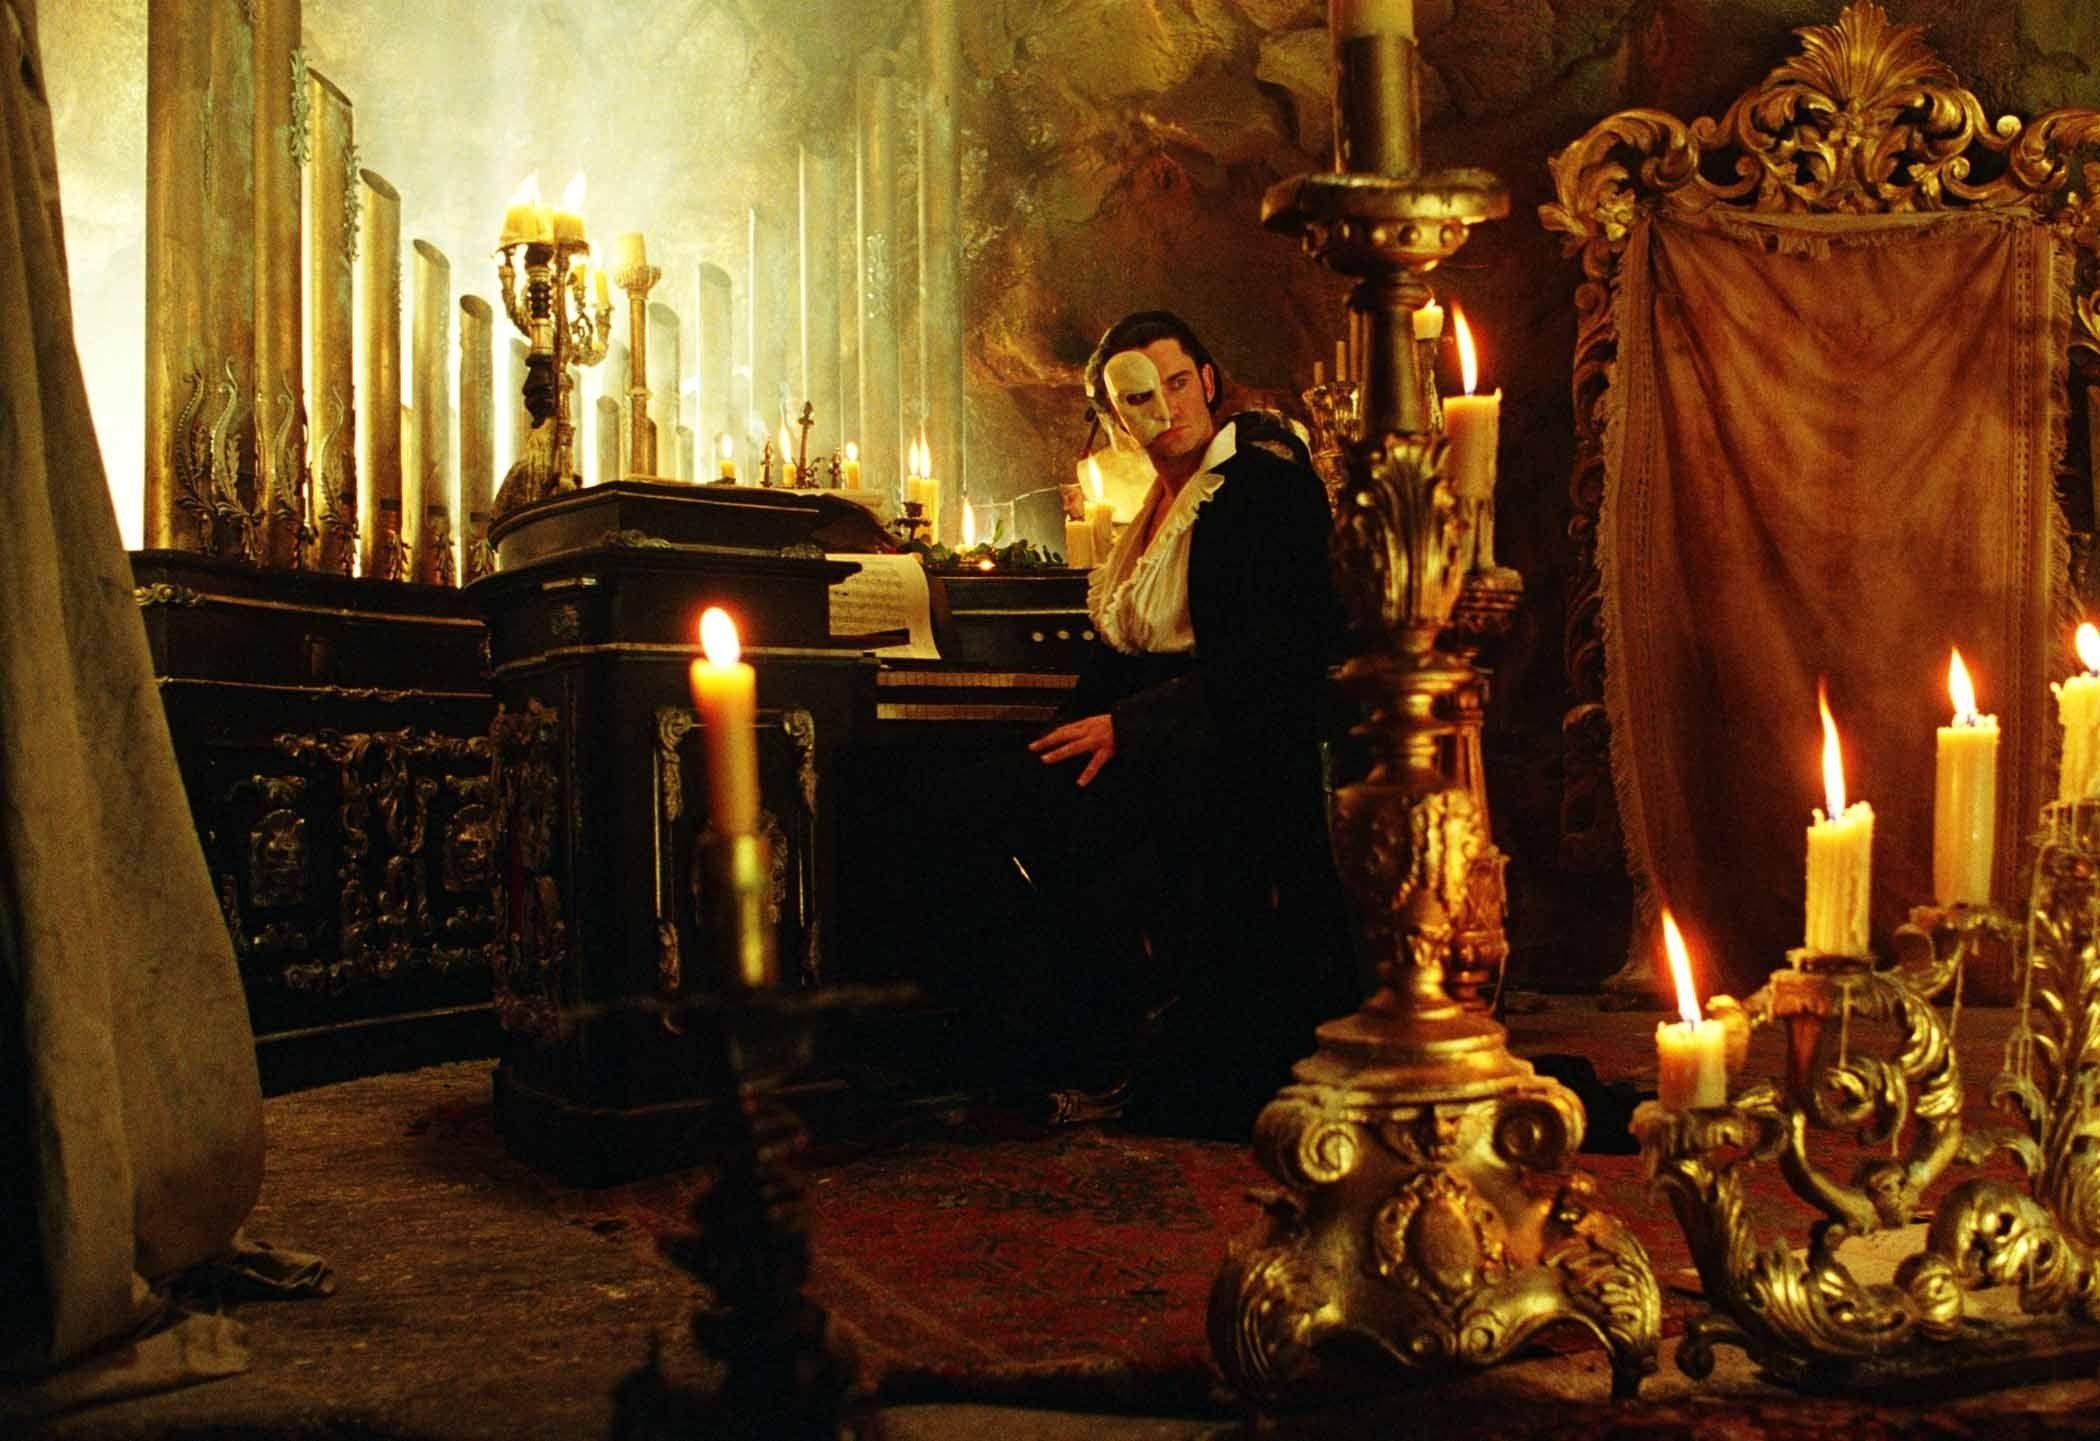 phantom of the opera adult film